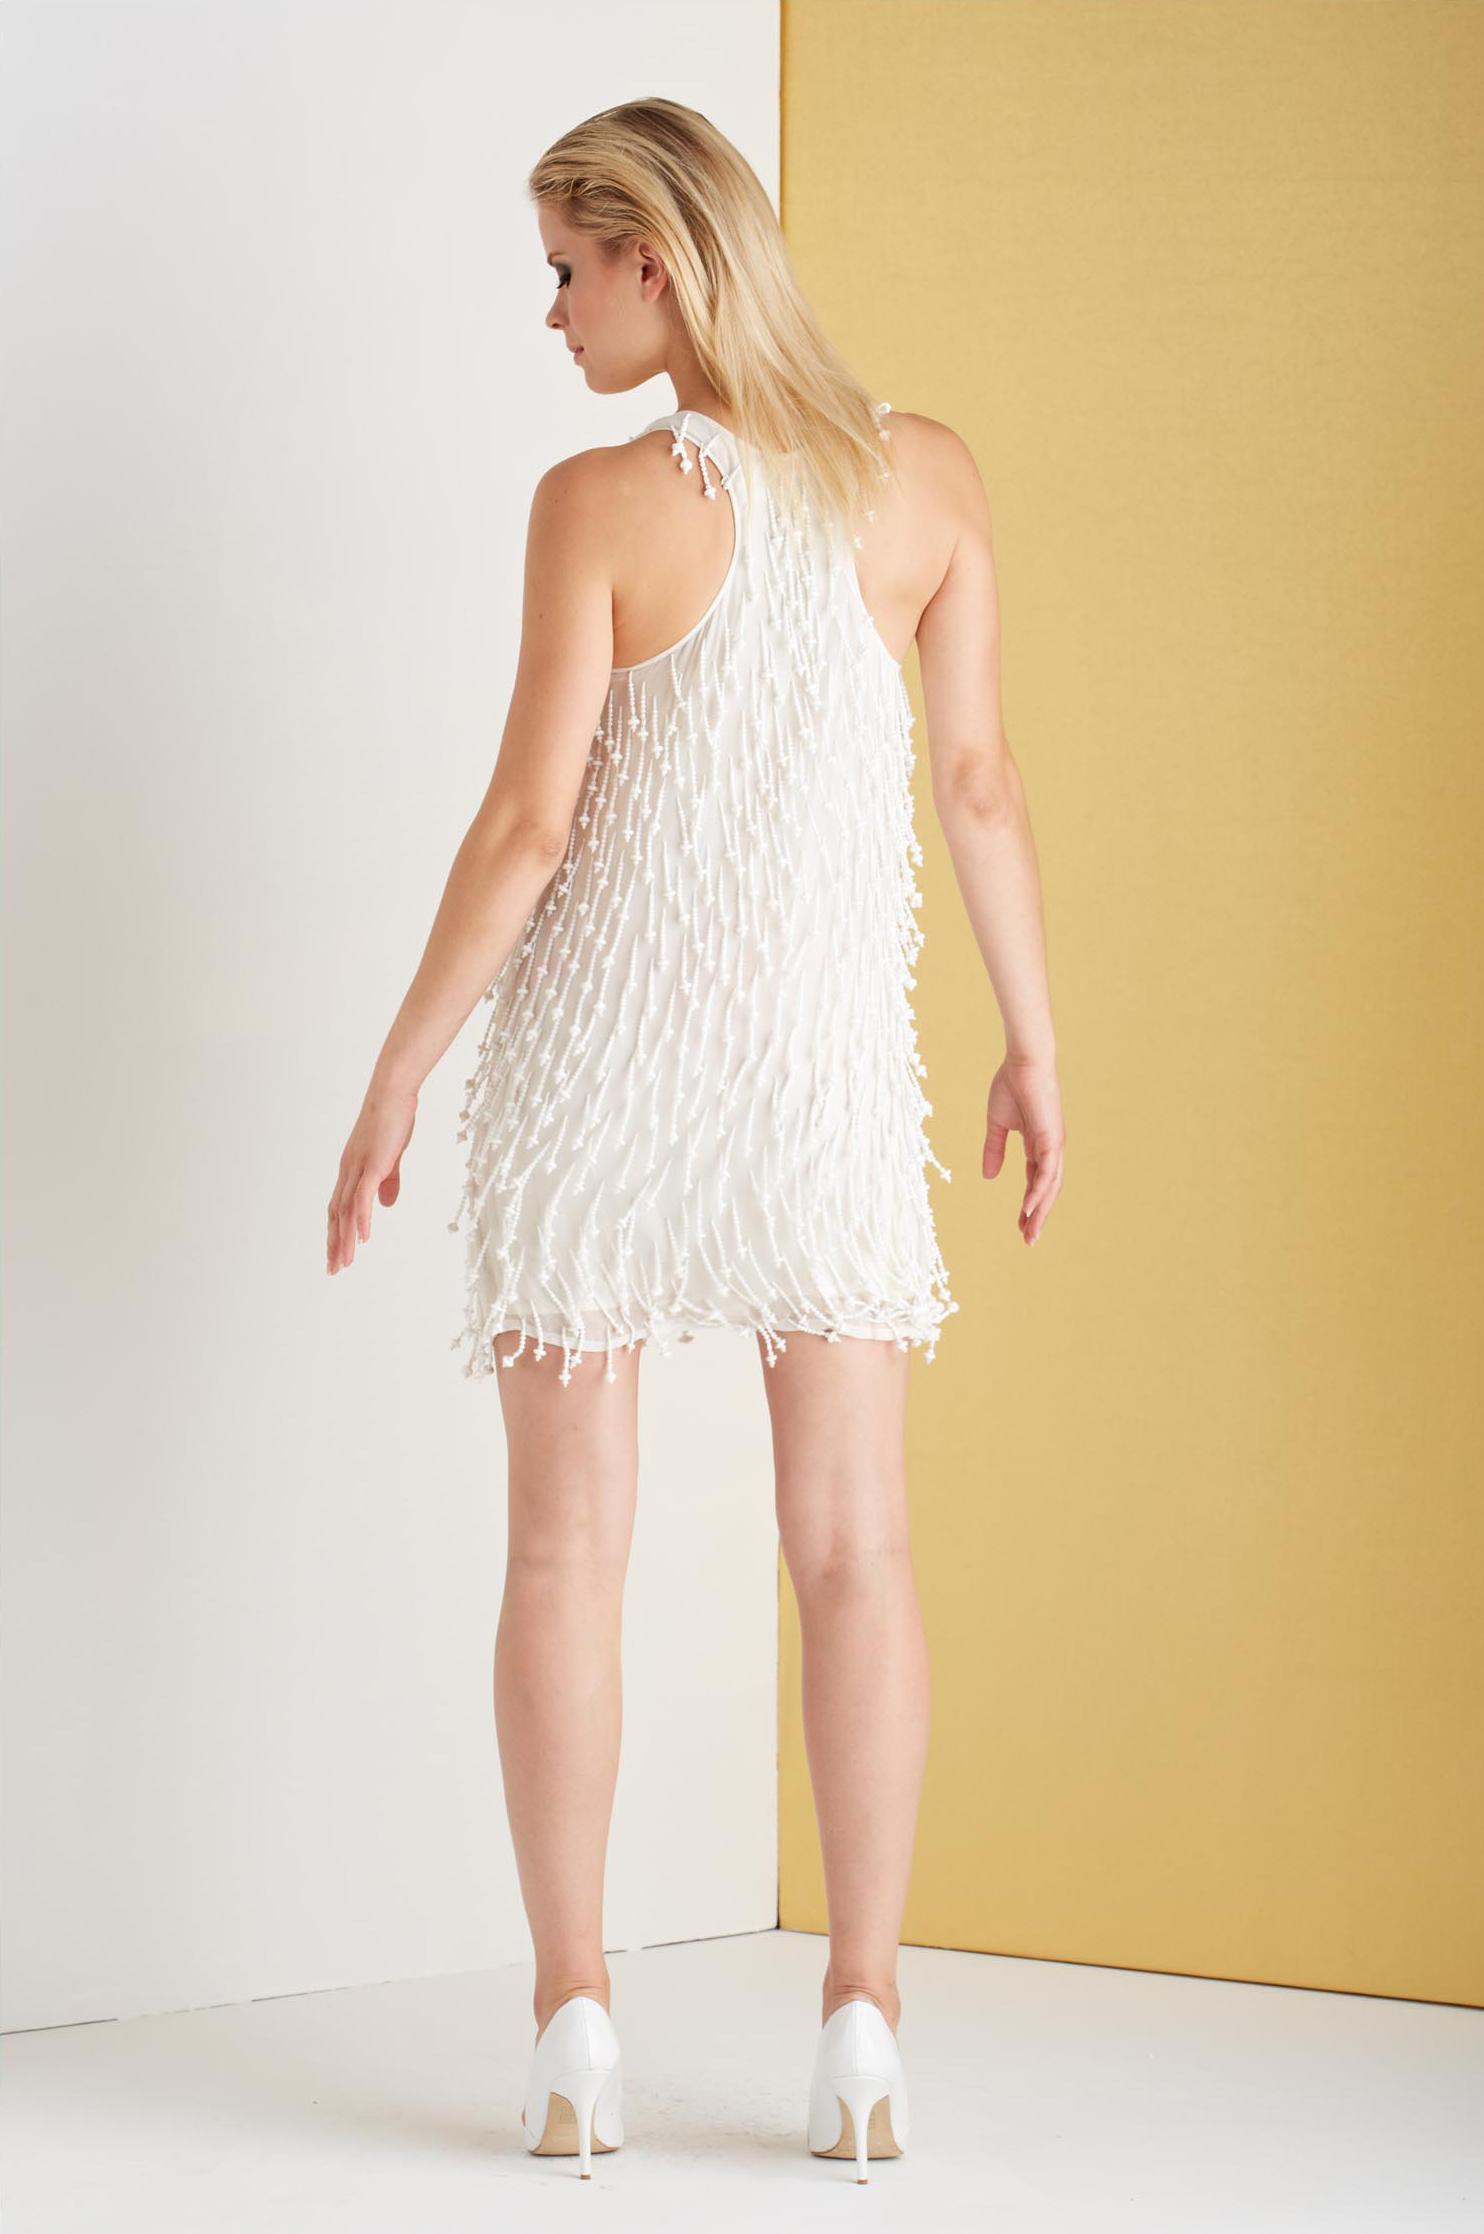 dress_ELISA_01 - Copy